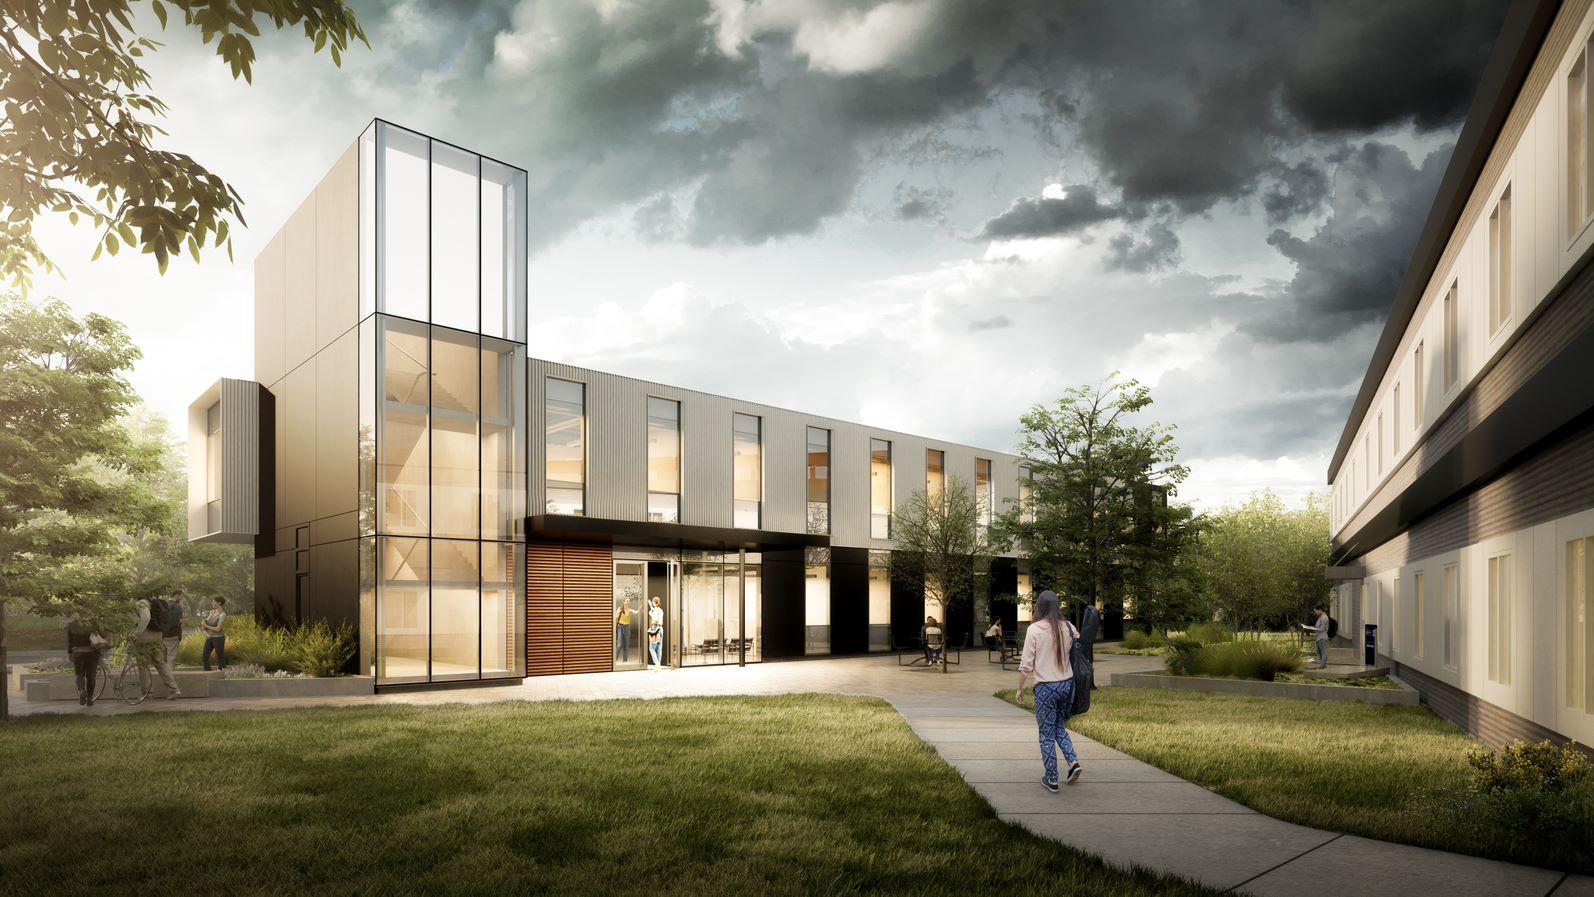 University of Toronto Modular Building Design, Mississauga, Ontario